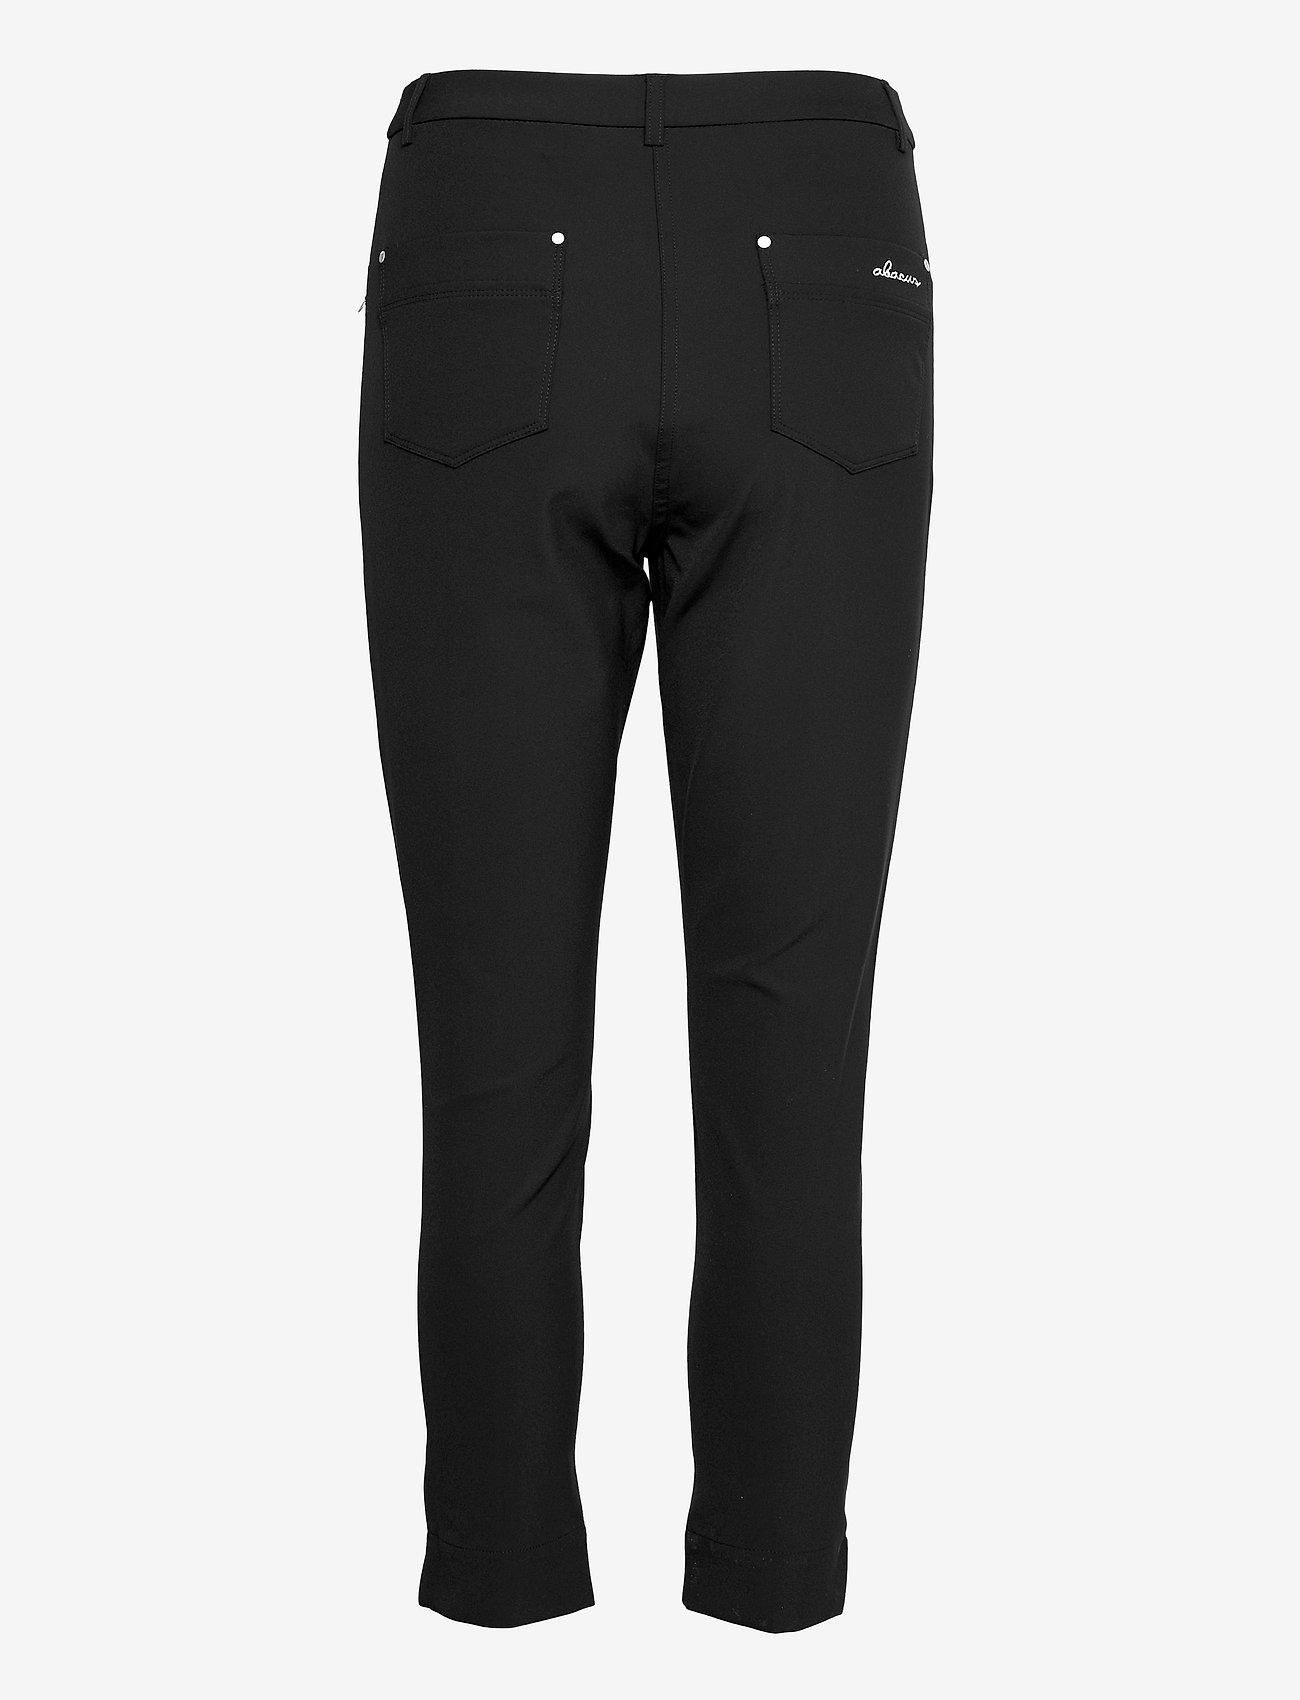 Abacus - Lds Grace high waist 7/8 trousers 92cm - golfbroeken - black - 1